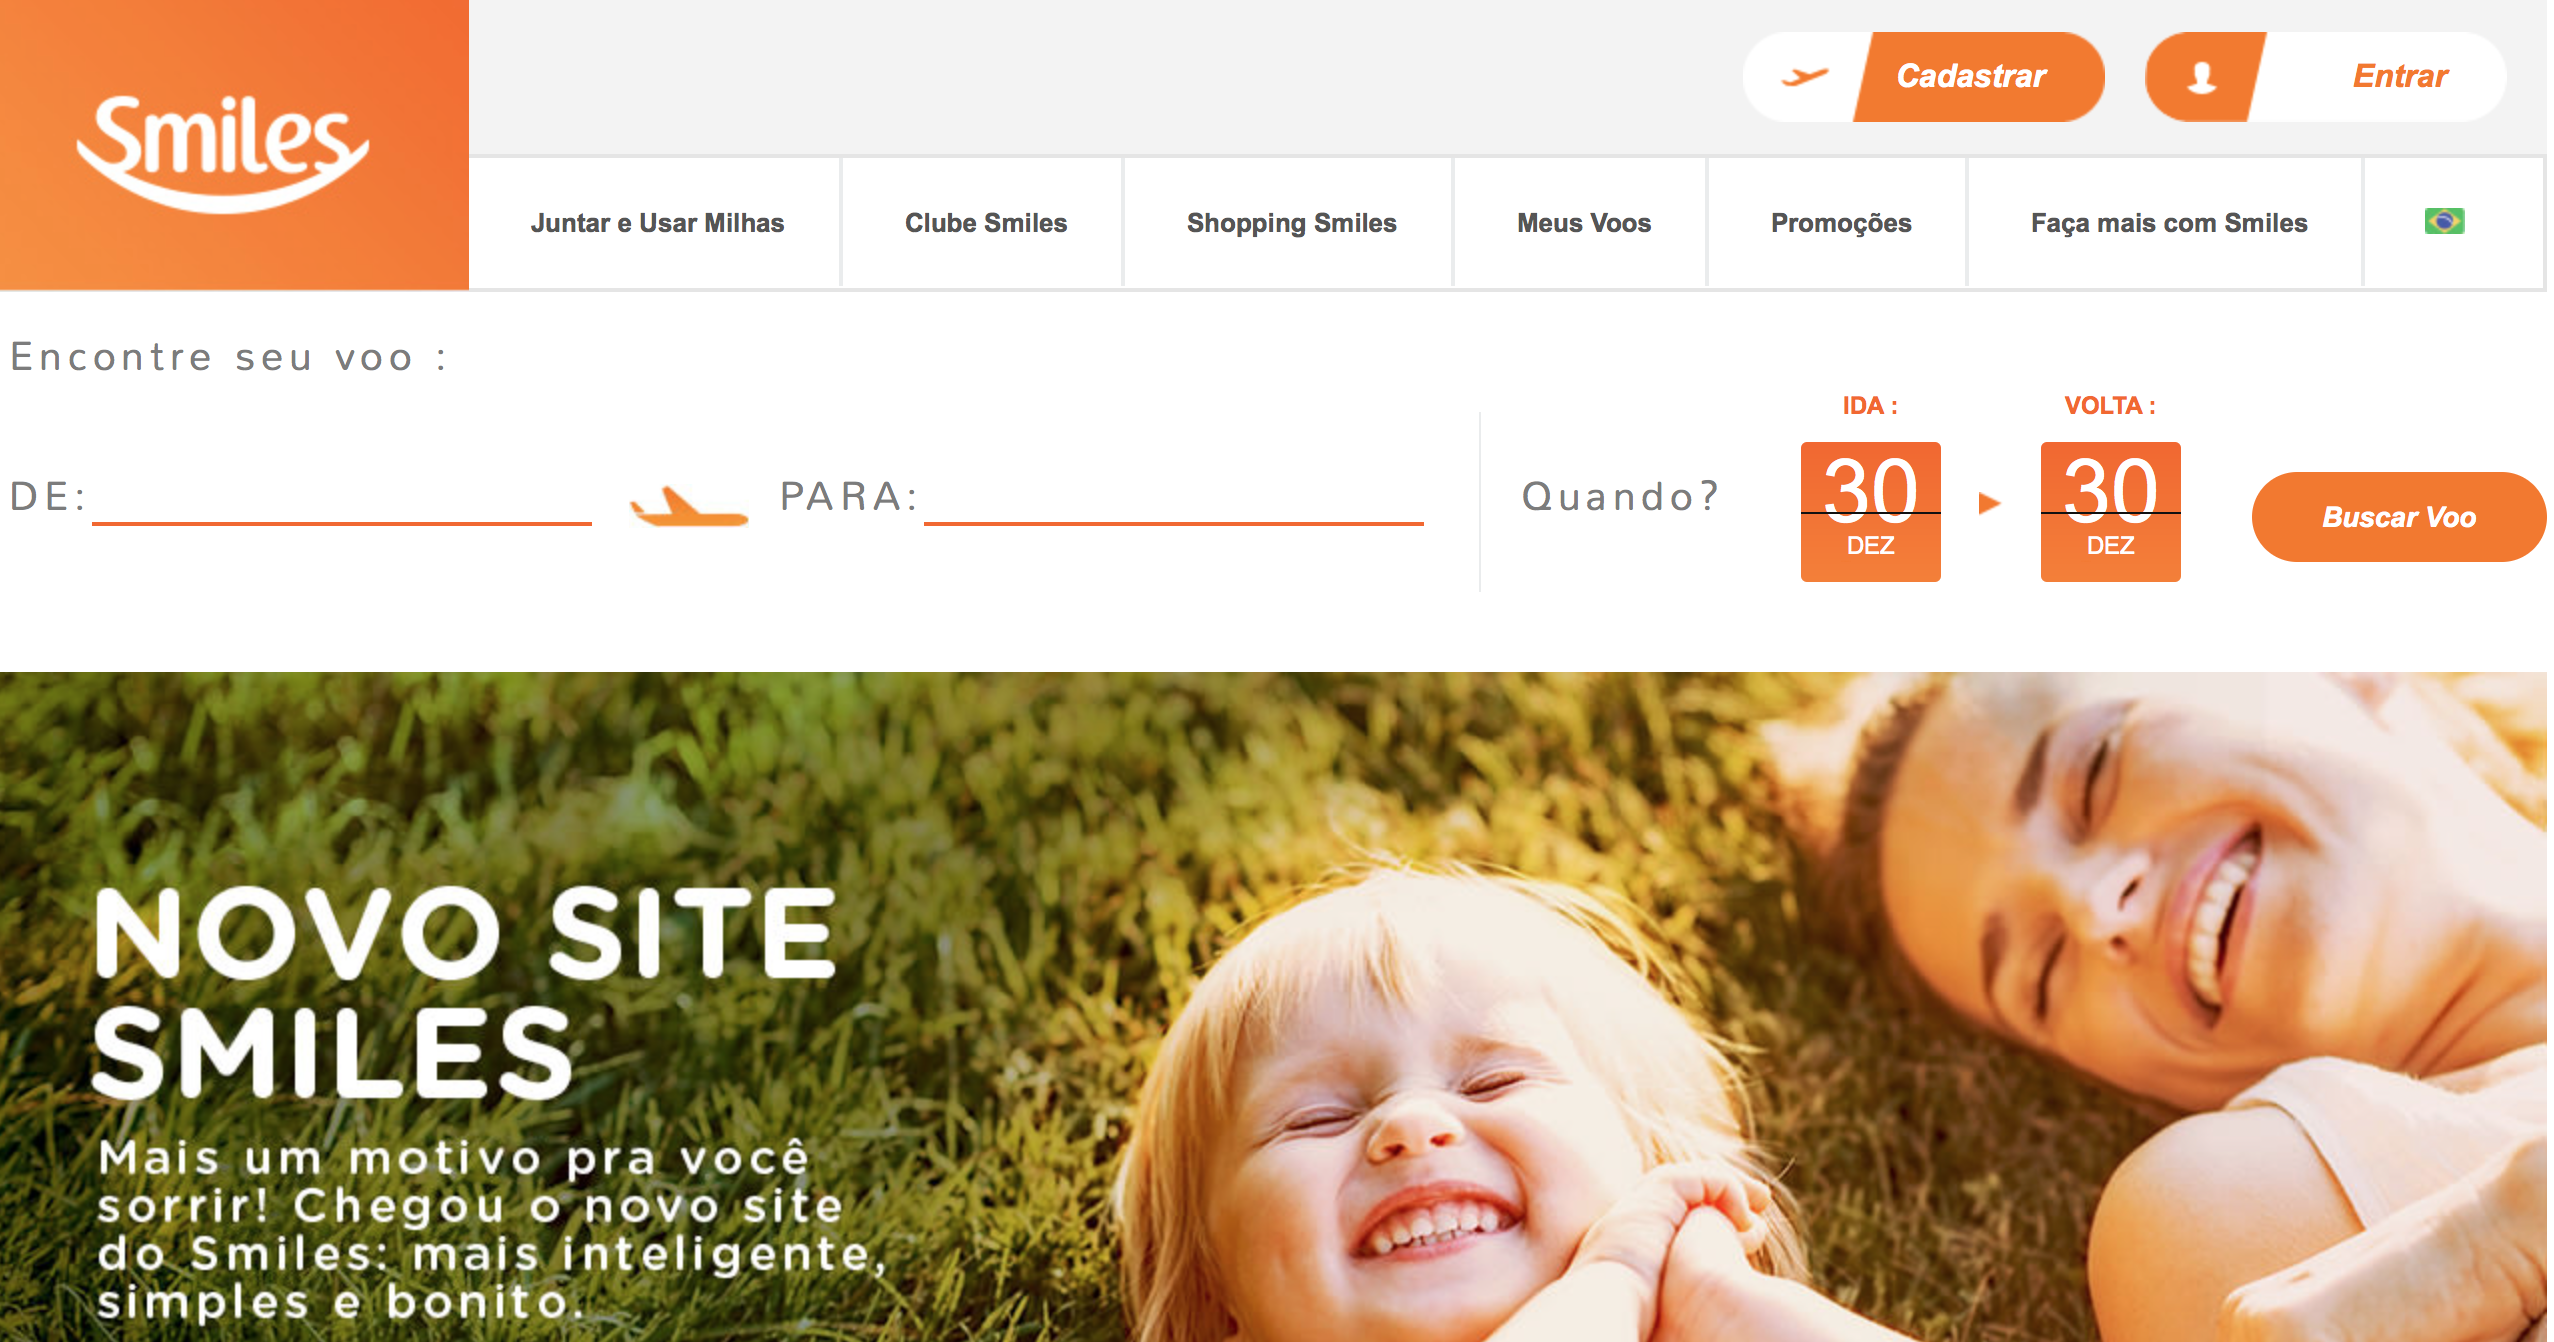 novo site smiles